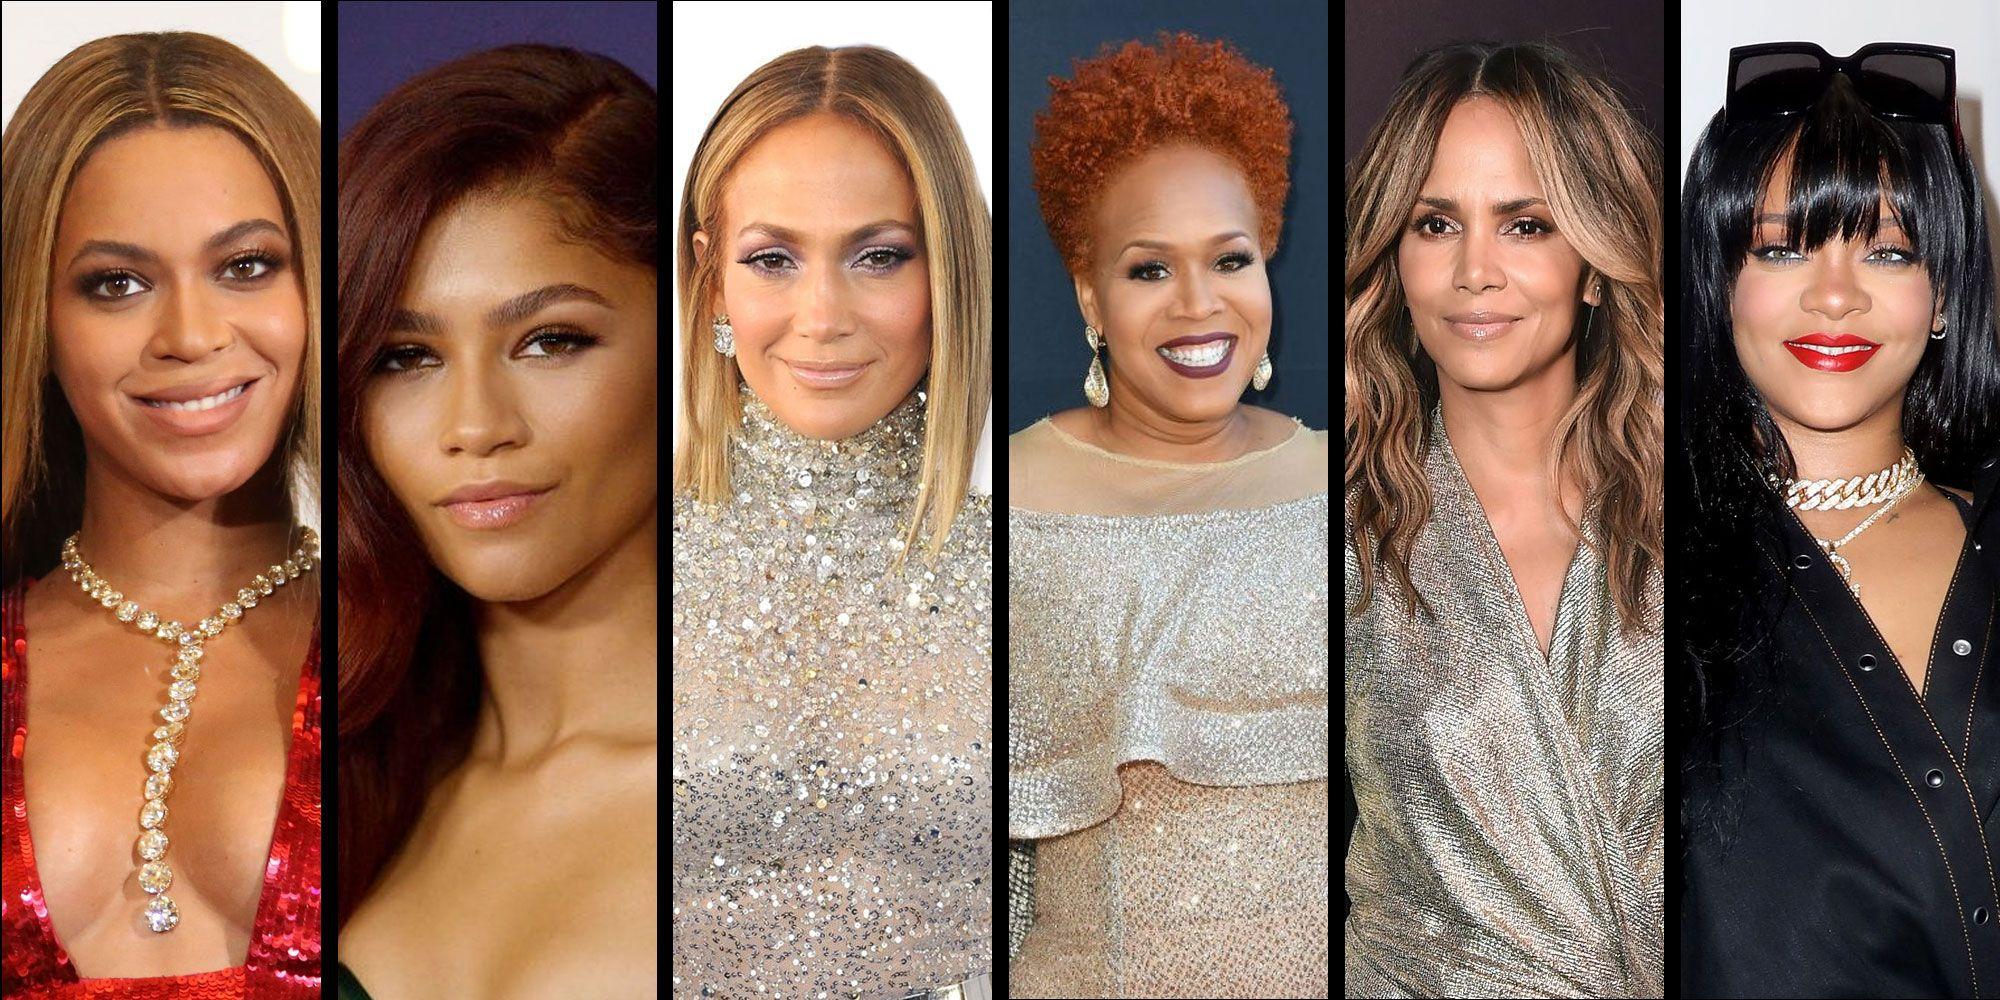 20 Hair Color Ideas for Dark Skin   Hair Colors for Black Women